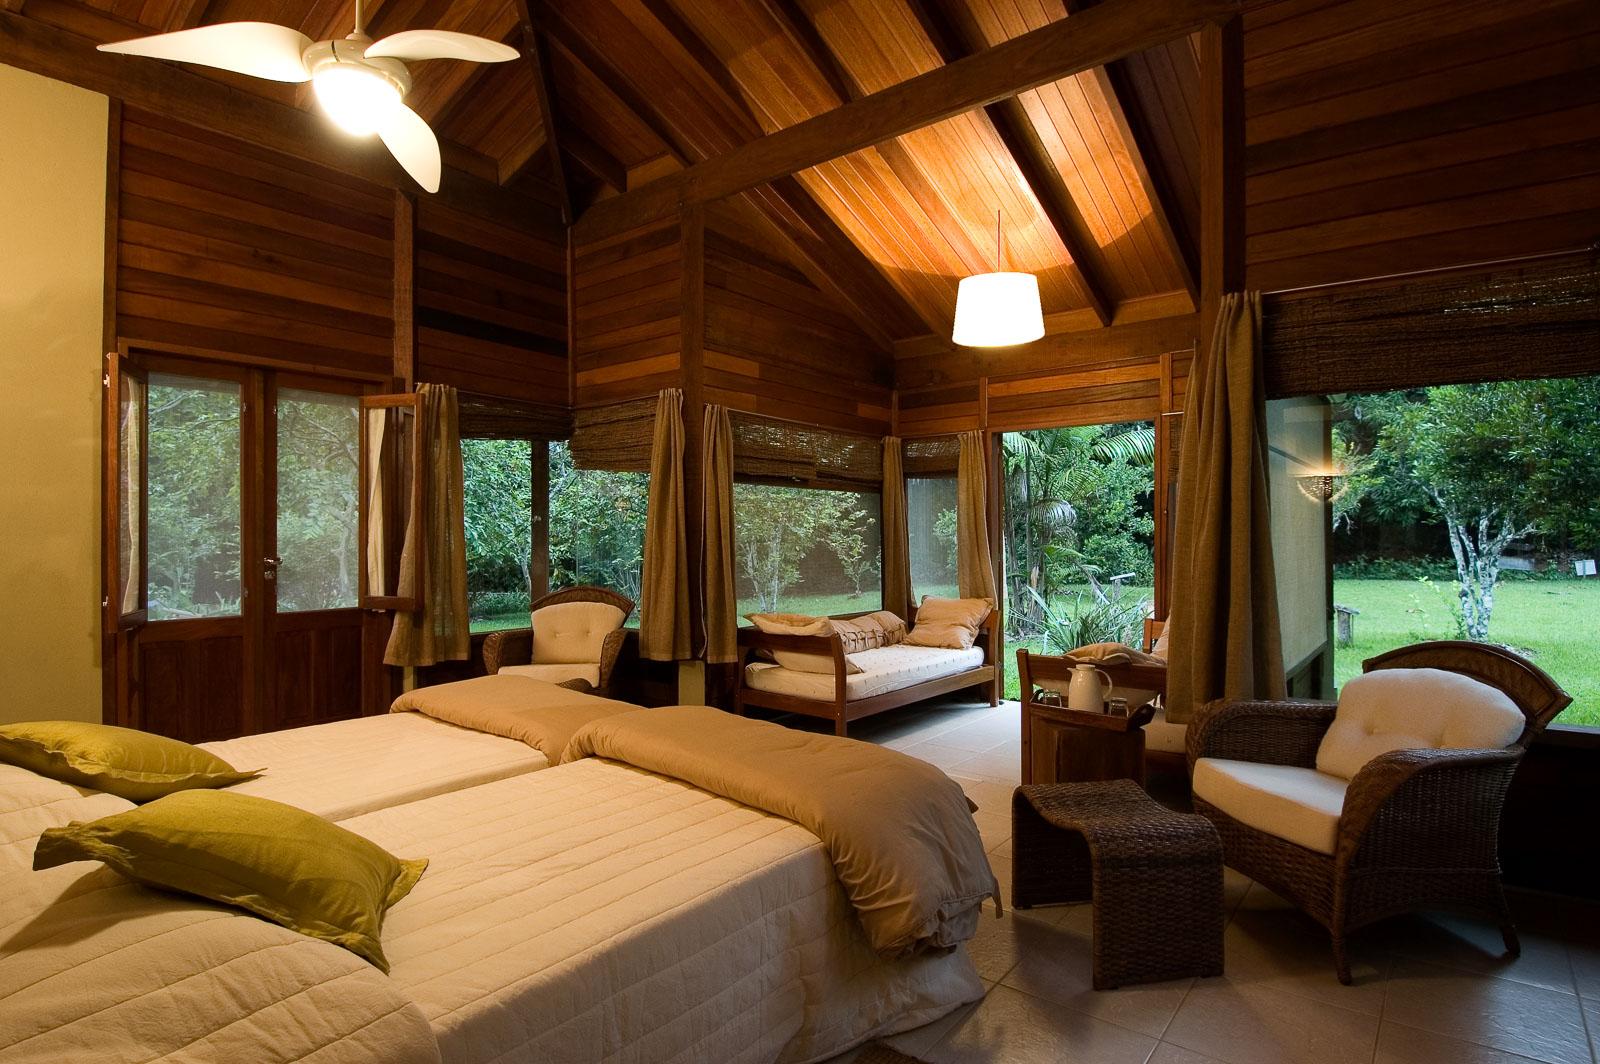 Cristalino Jungle Lodge - Private Bungalow Inside - Katia Kuwabara_-Edit-Edit.jpg